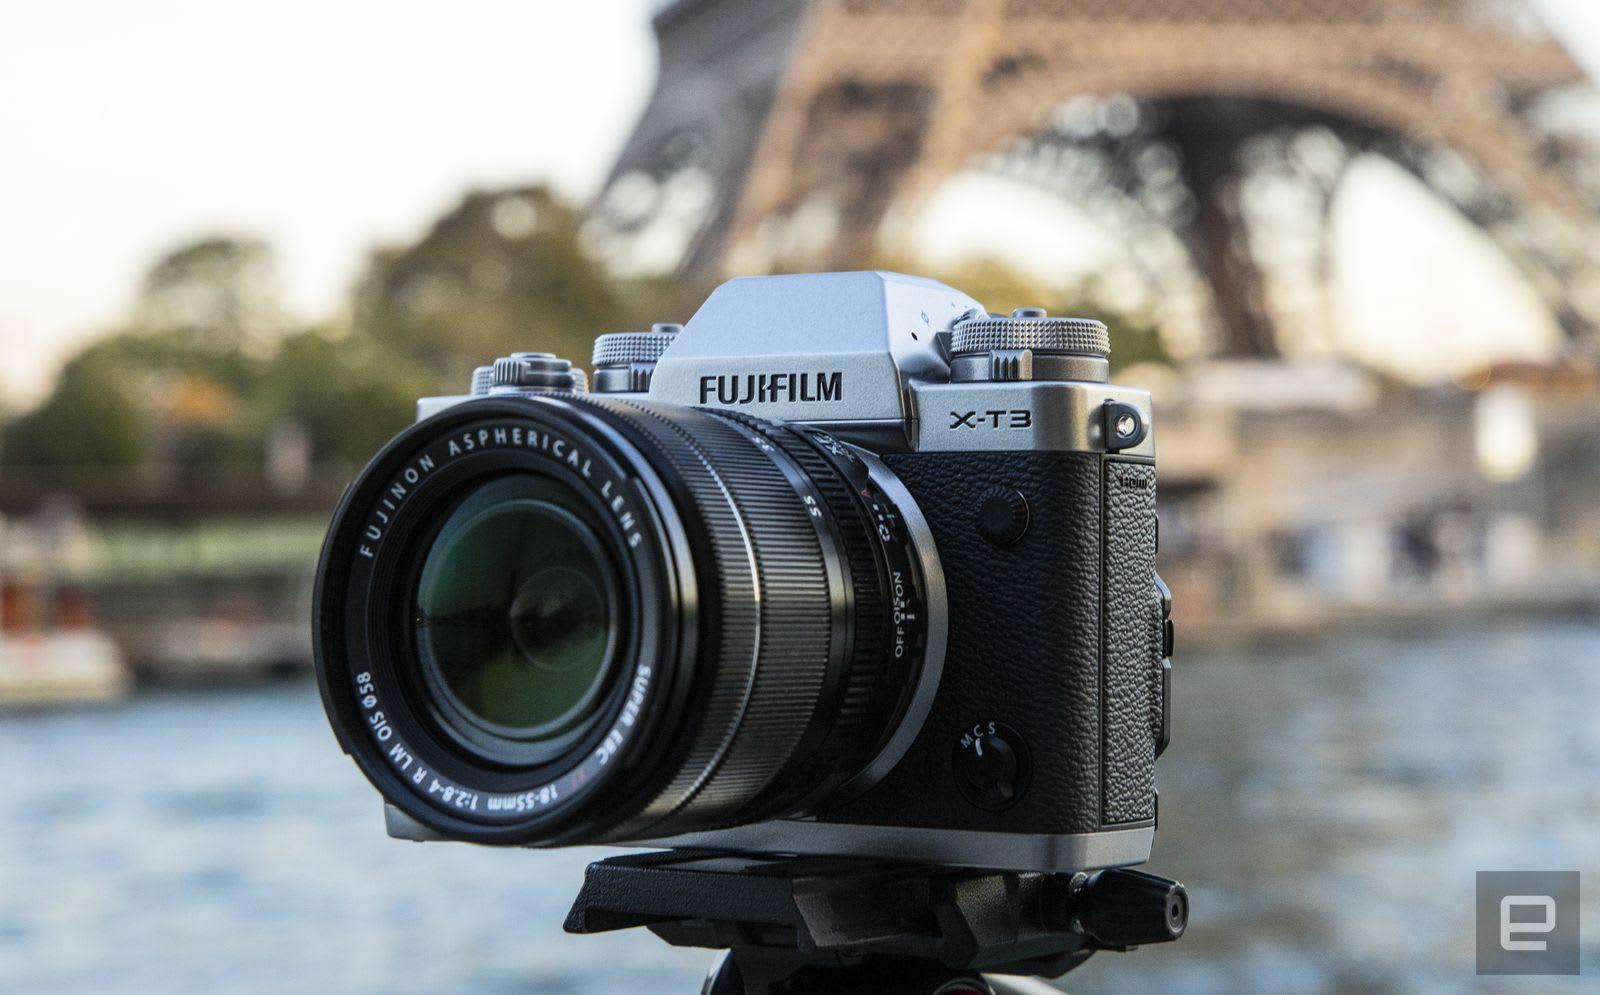 Fujifilim X-T3 camera year in review